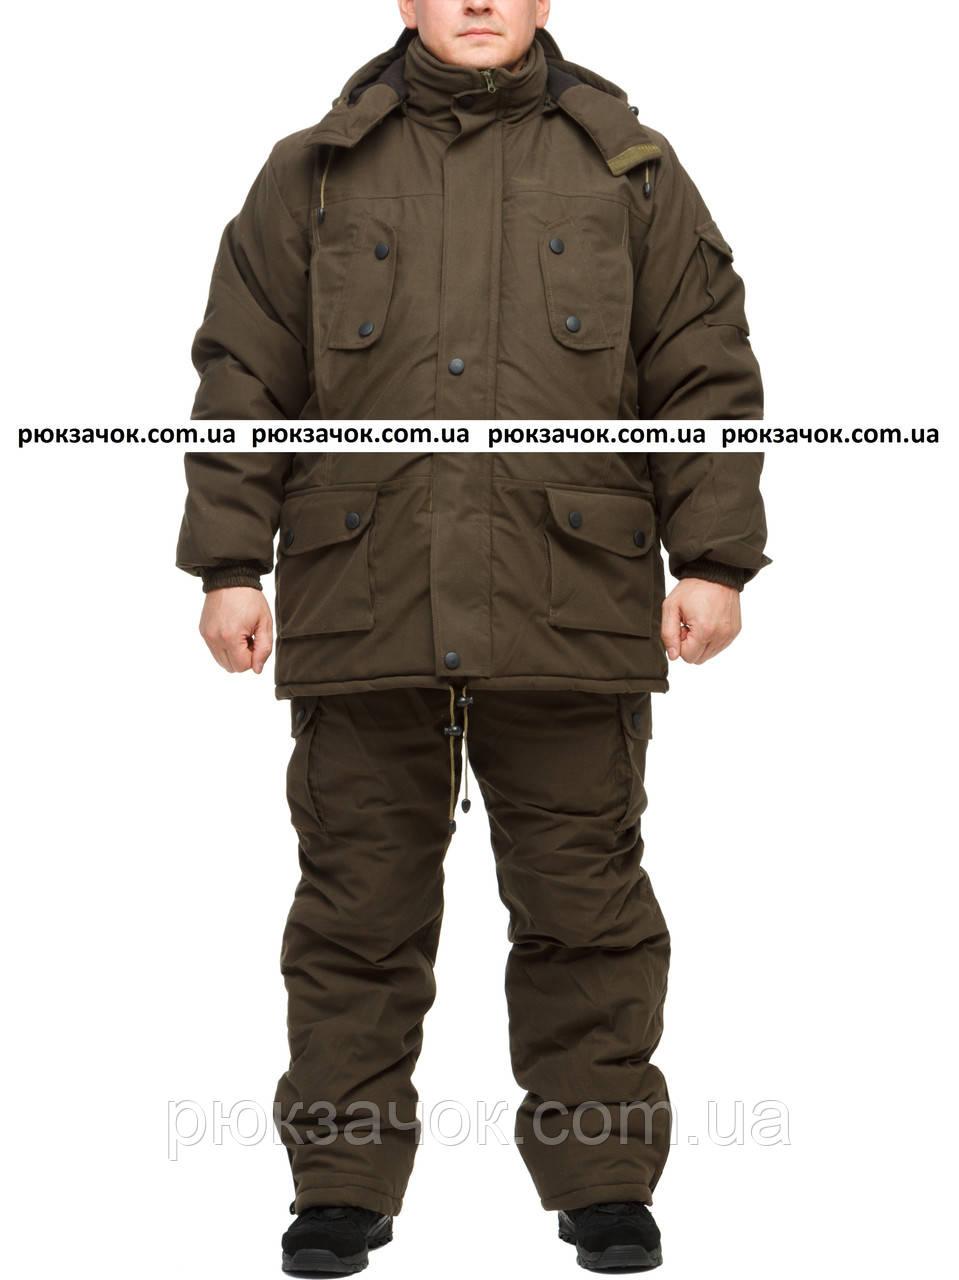 "Теплый охотничий костюм на зиму ""Хаки"" размер 60-62, фото 1"